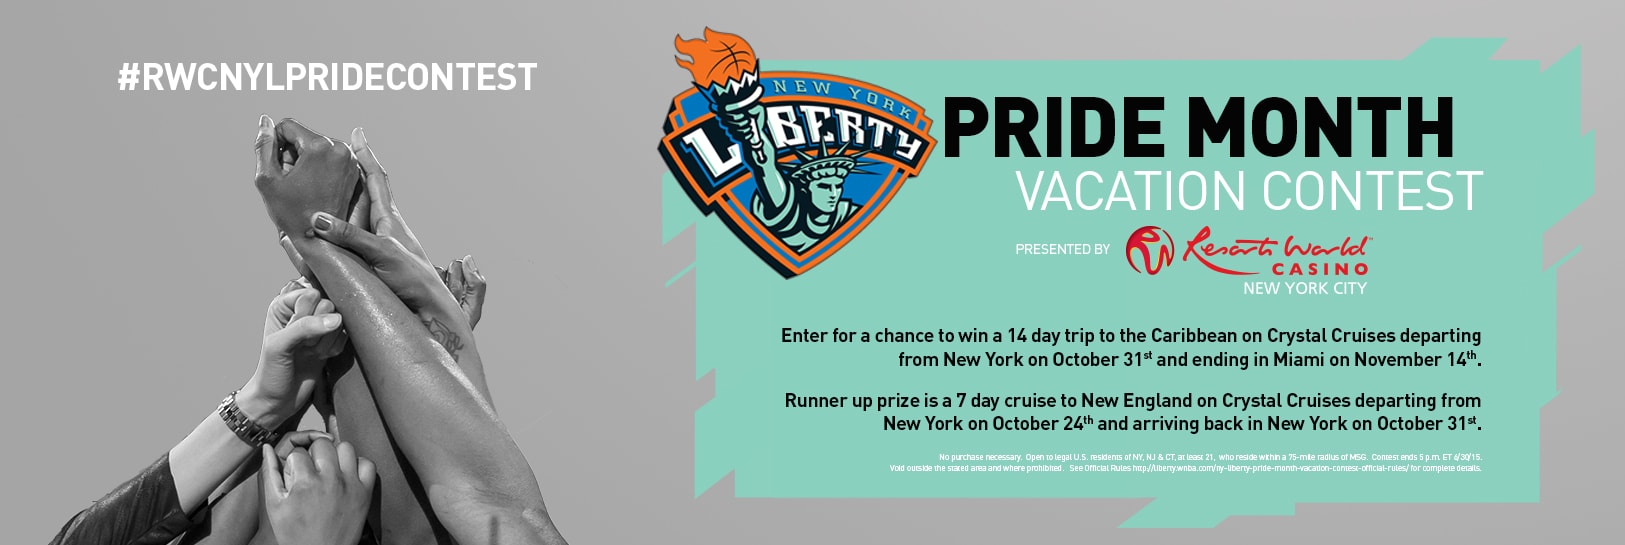 NYL-RWC-PrideNight-Contest-1625x585